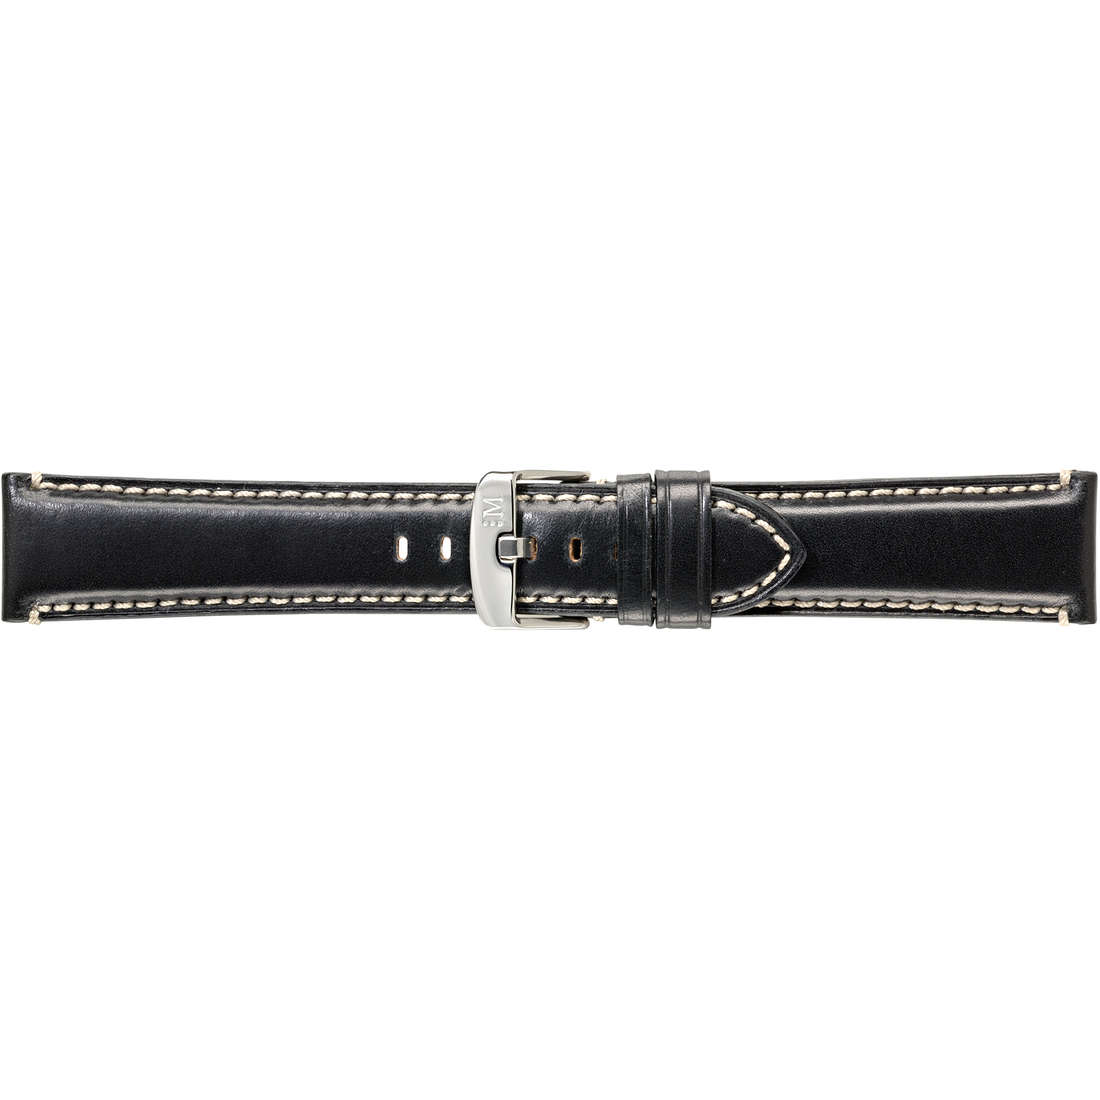 watch watch bands watch straps man Morellato Manufatti A01X4272B12019CR22